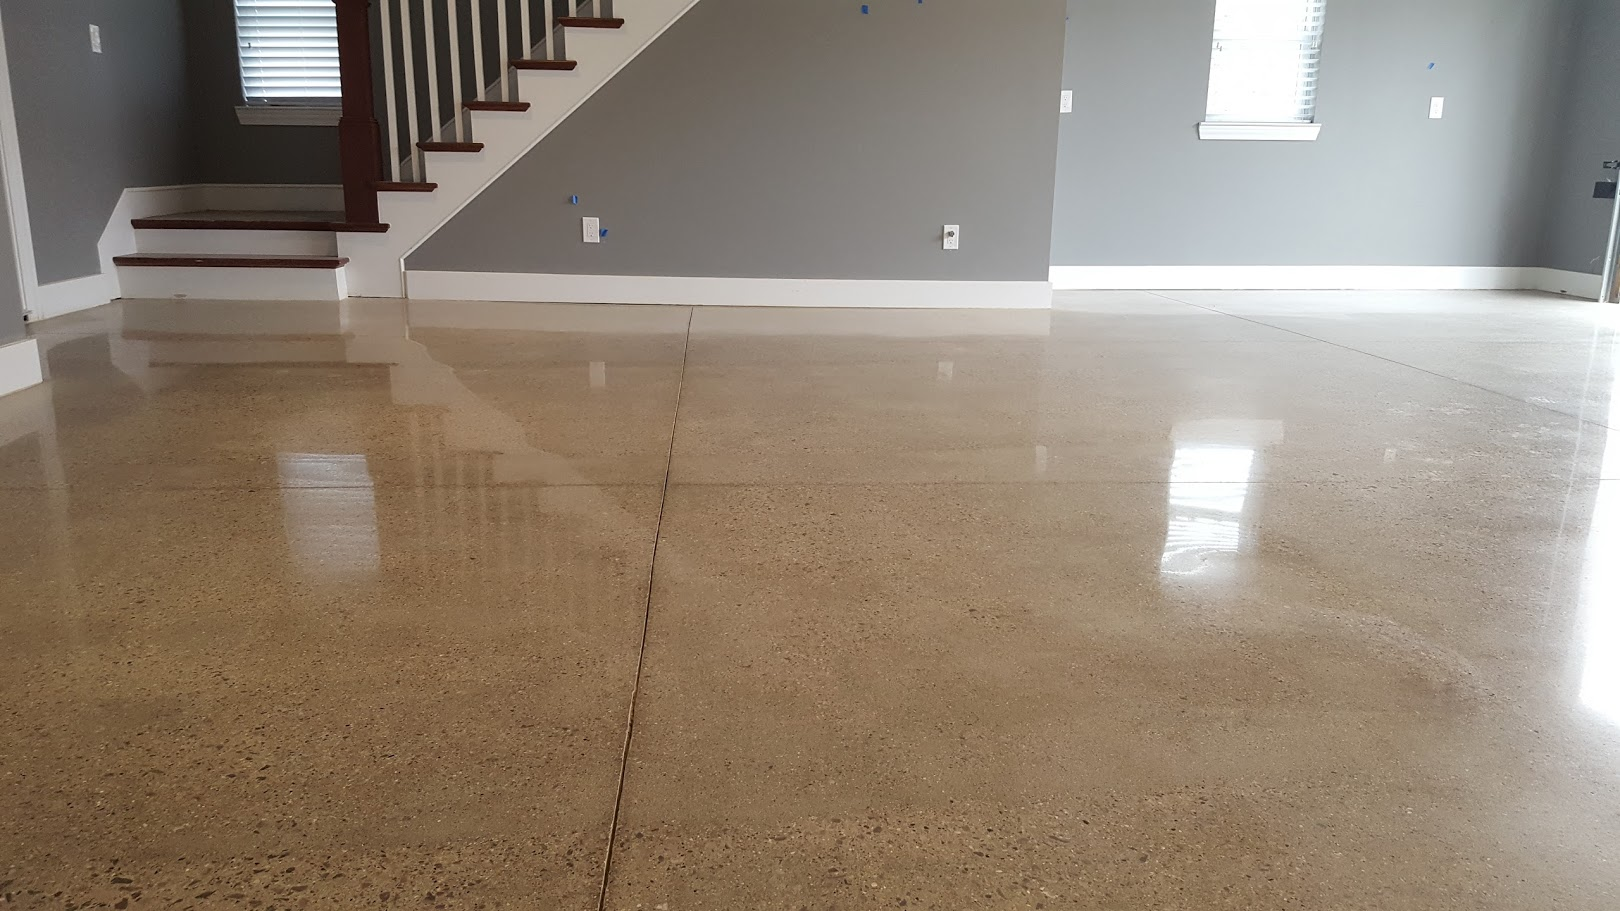 High polished concrete